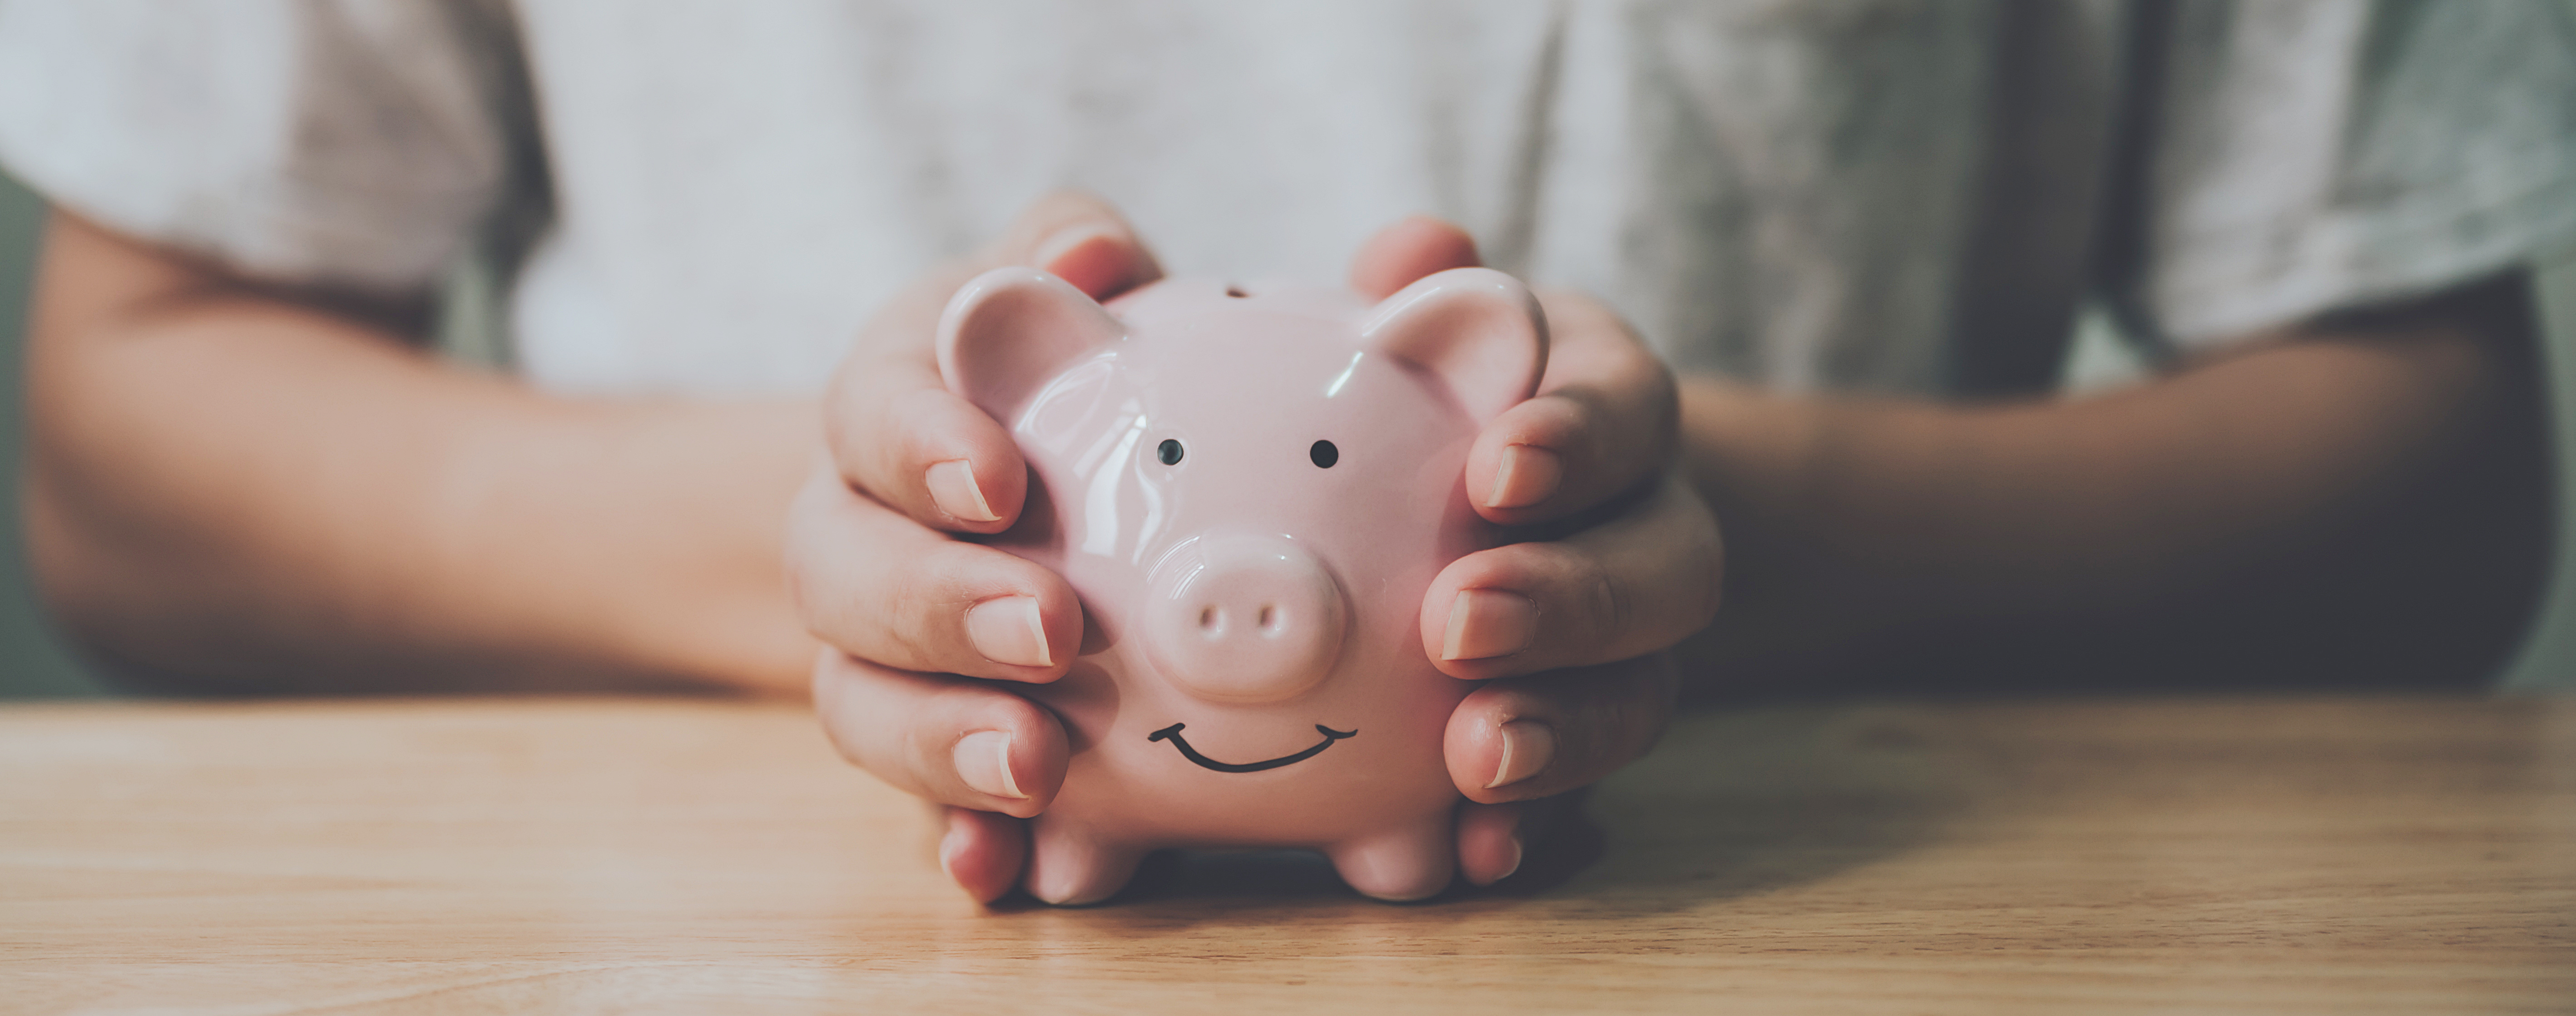 10 Money-Saving Strategies for Your HOA